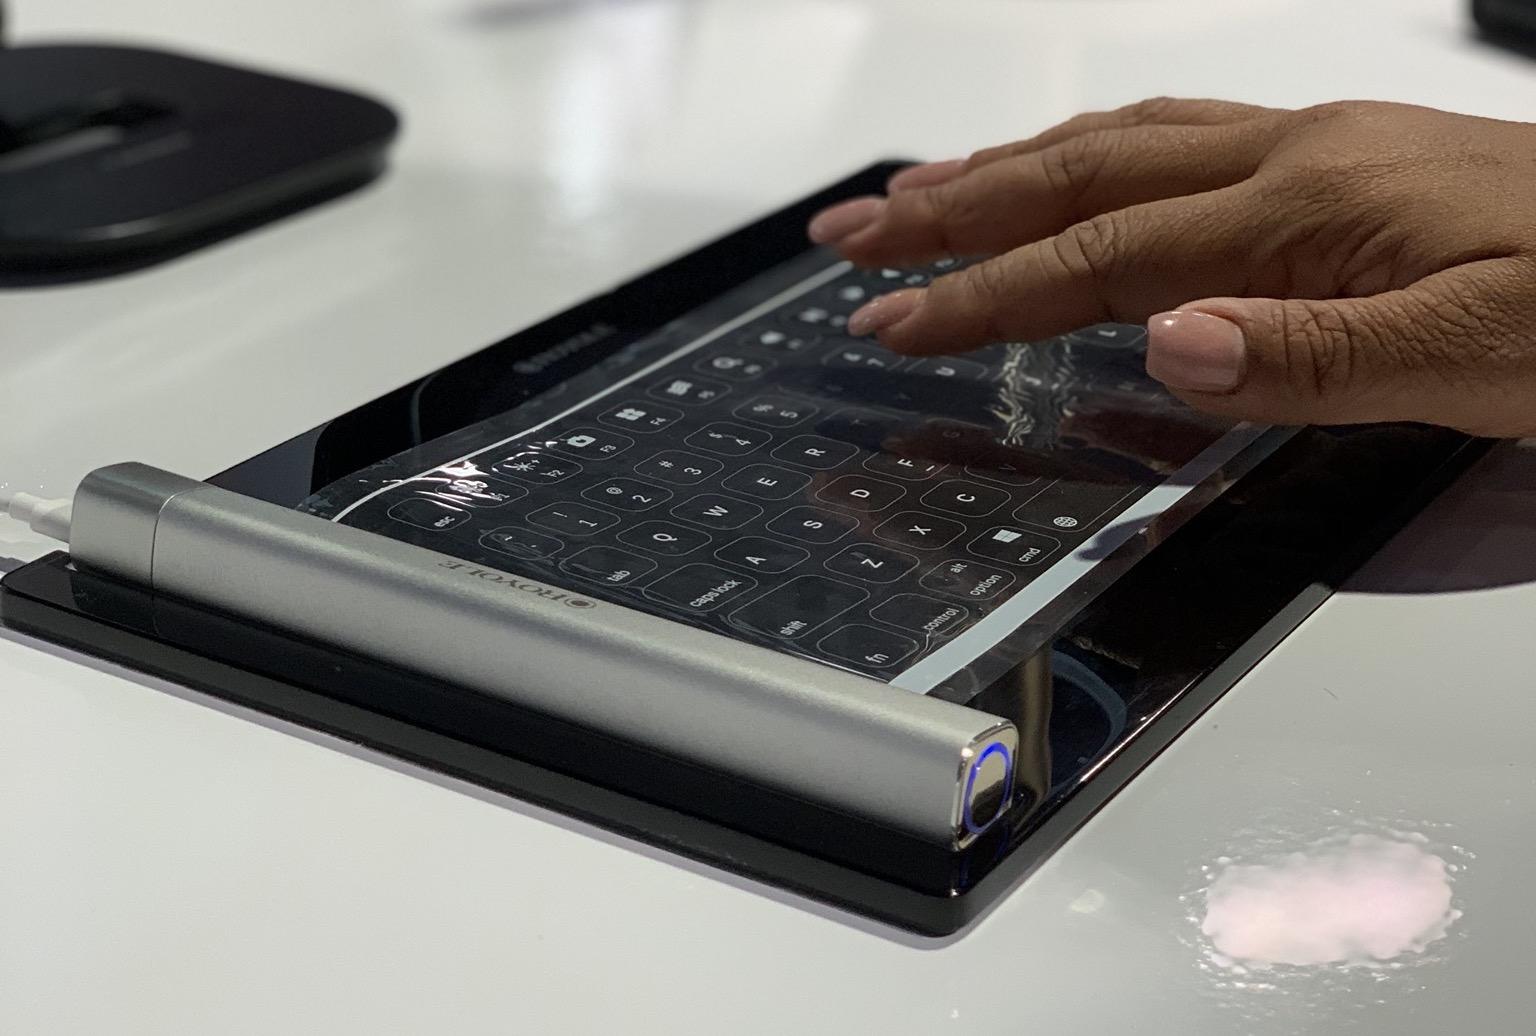 CES 2019: Pepcom Shows Off Futuristic Displays and More - TidBITS